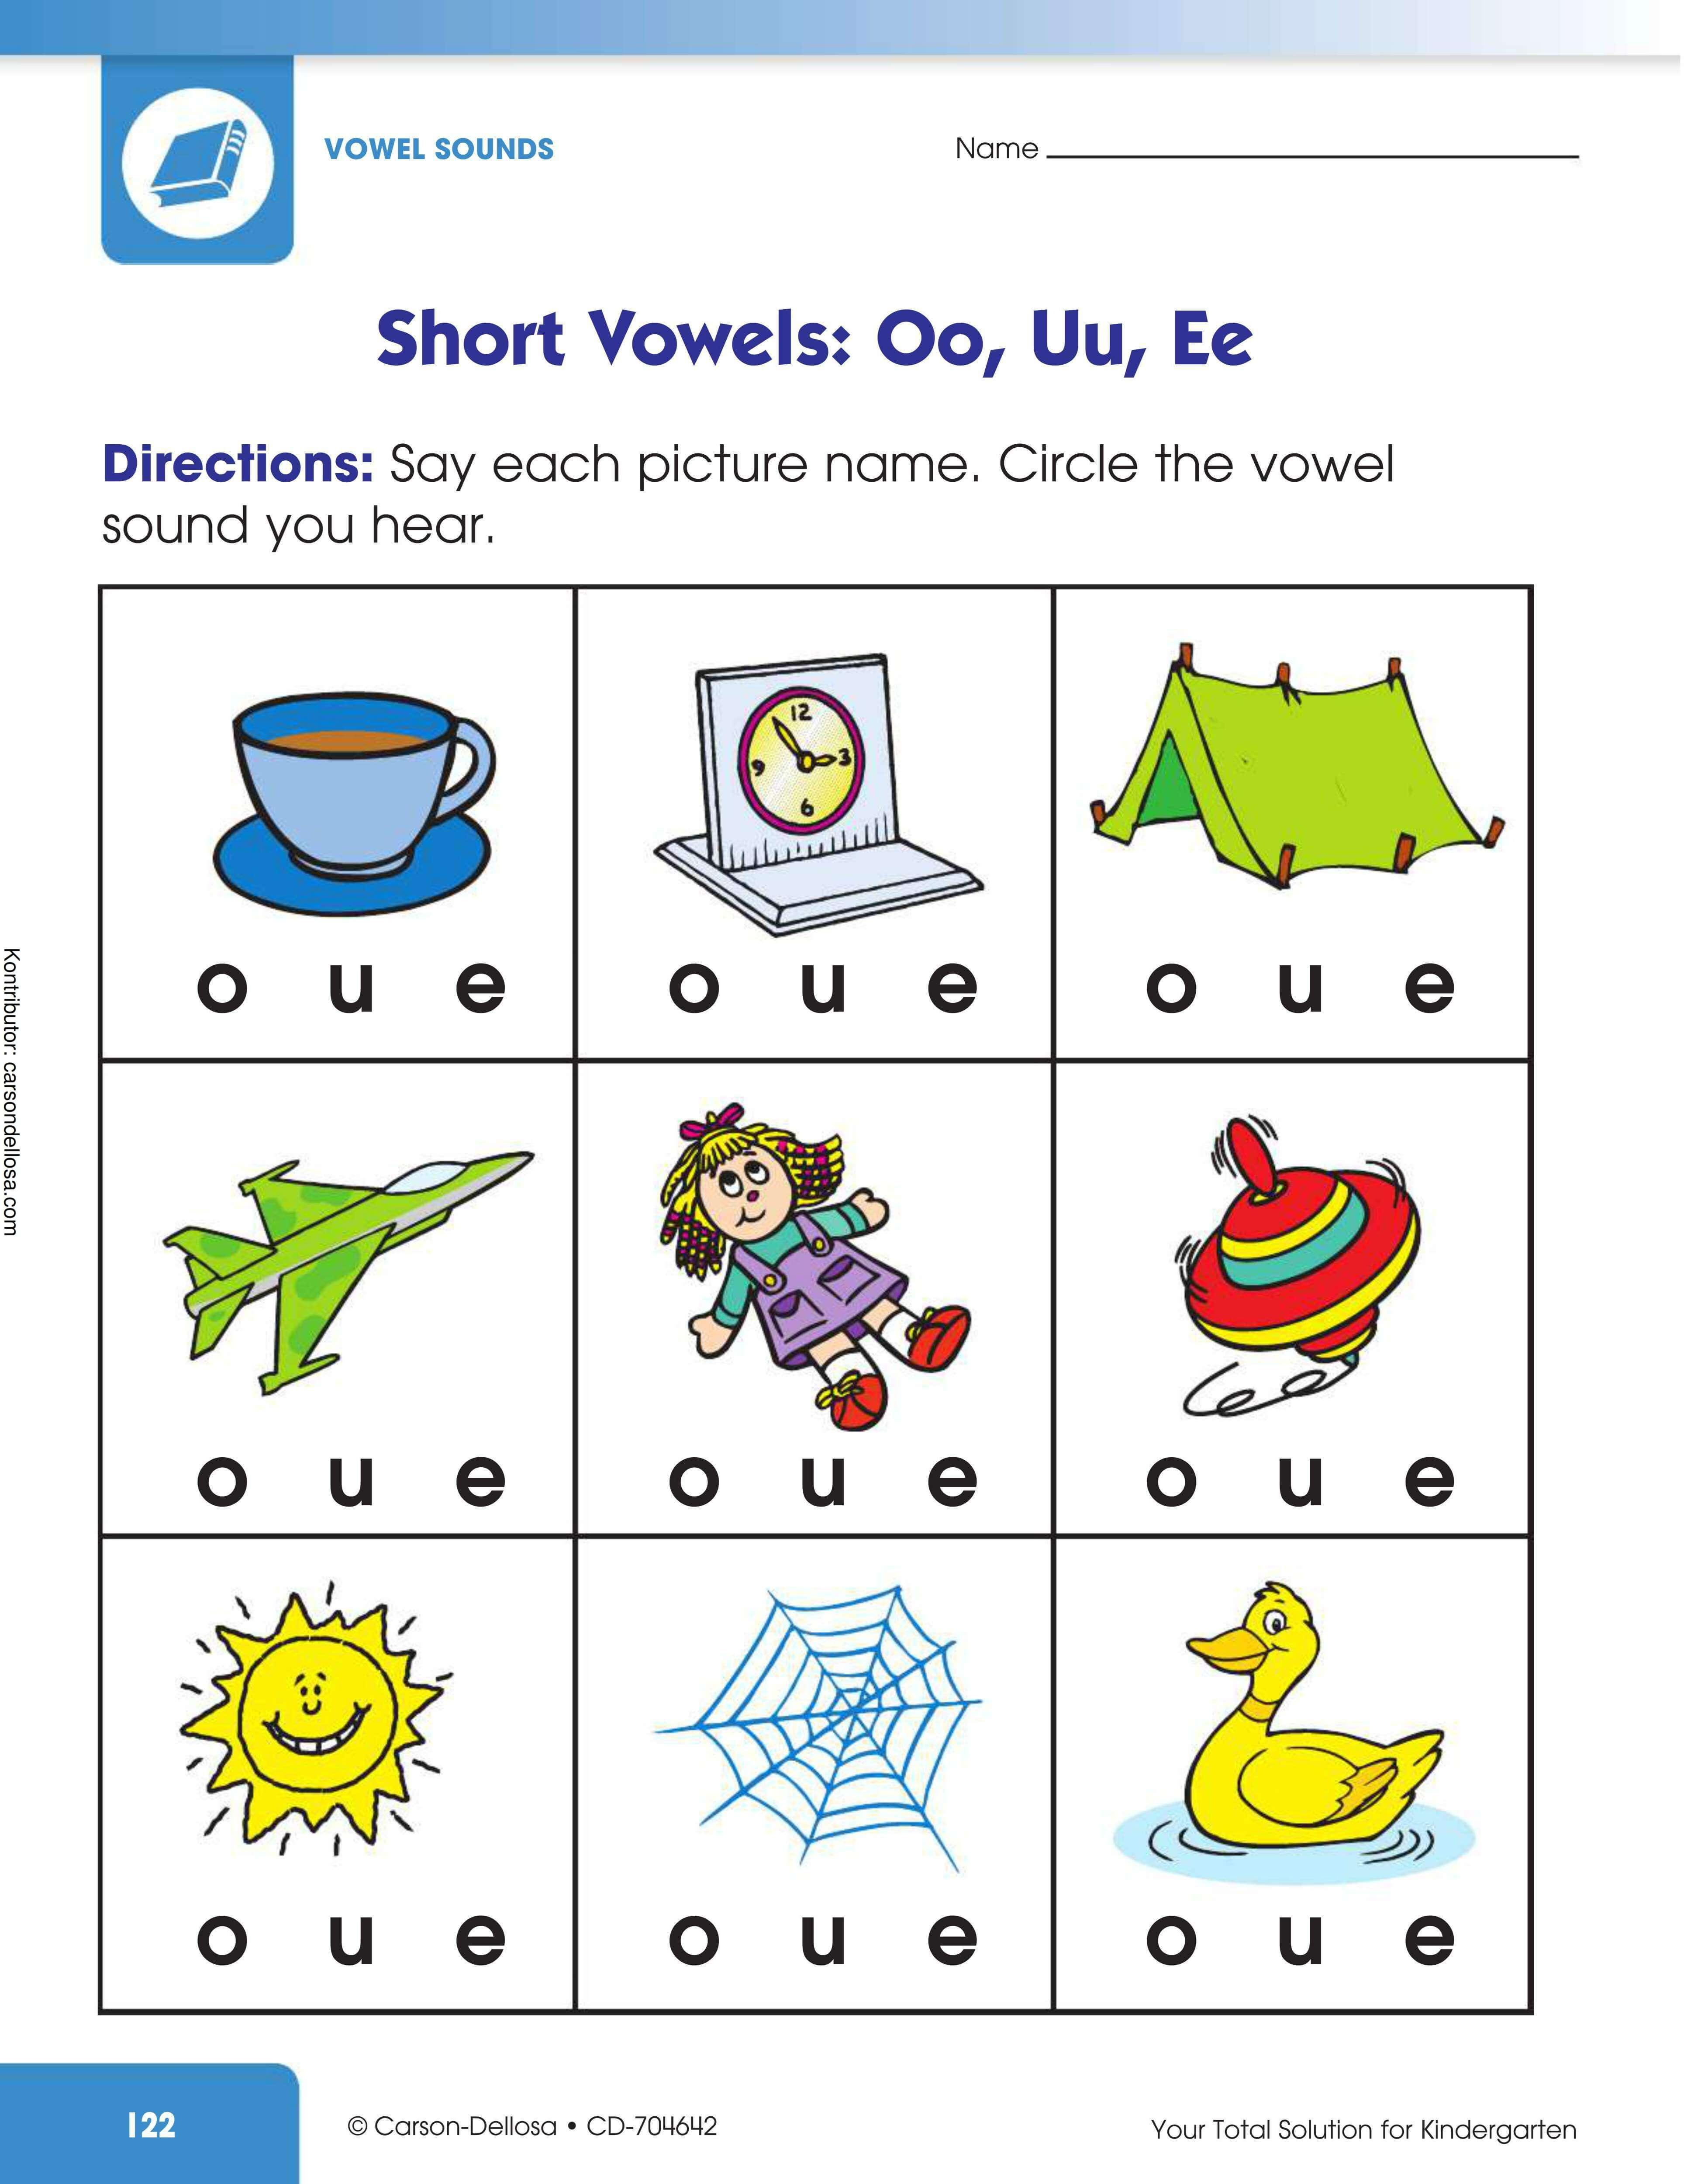 Belajar Mengenal Bunyi Huruf Vokal Pendek: Oo, Uu, Ee